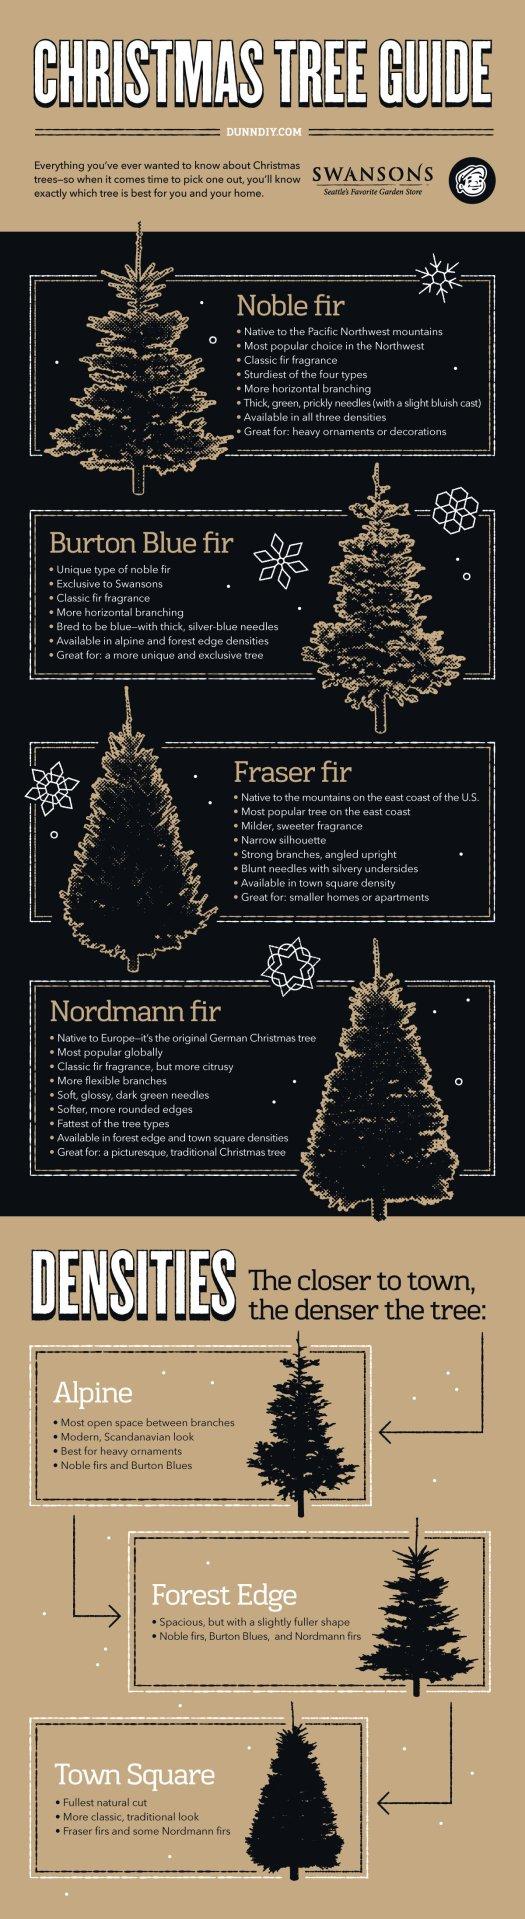 DunnDIY-ChristmasTreeGuide.jpg